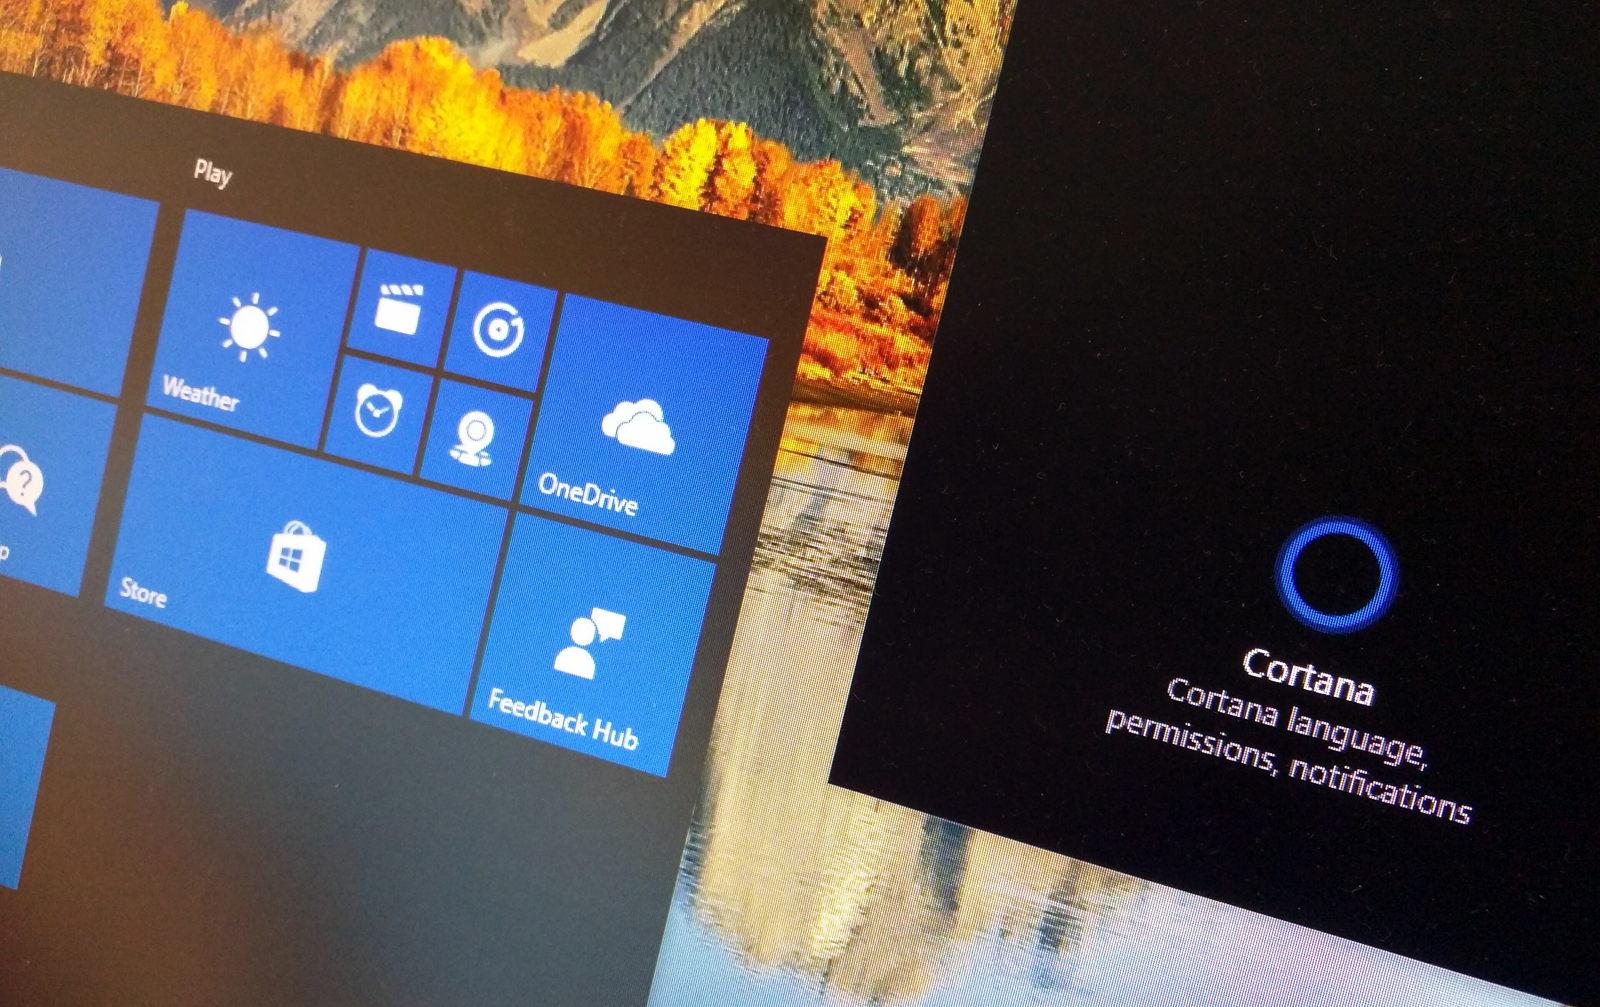 Windows 10 Fall Creators Update final version